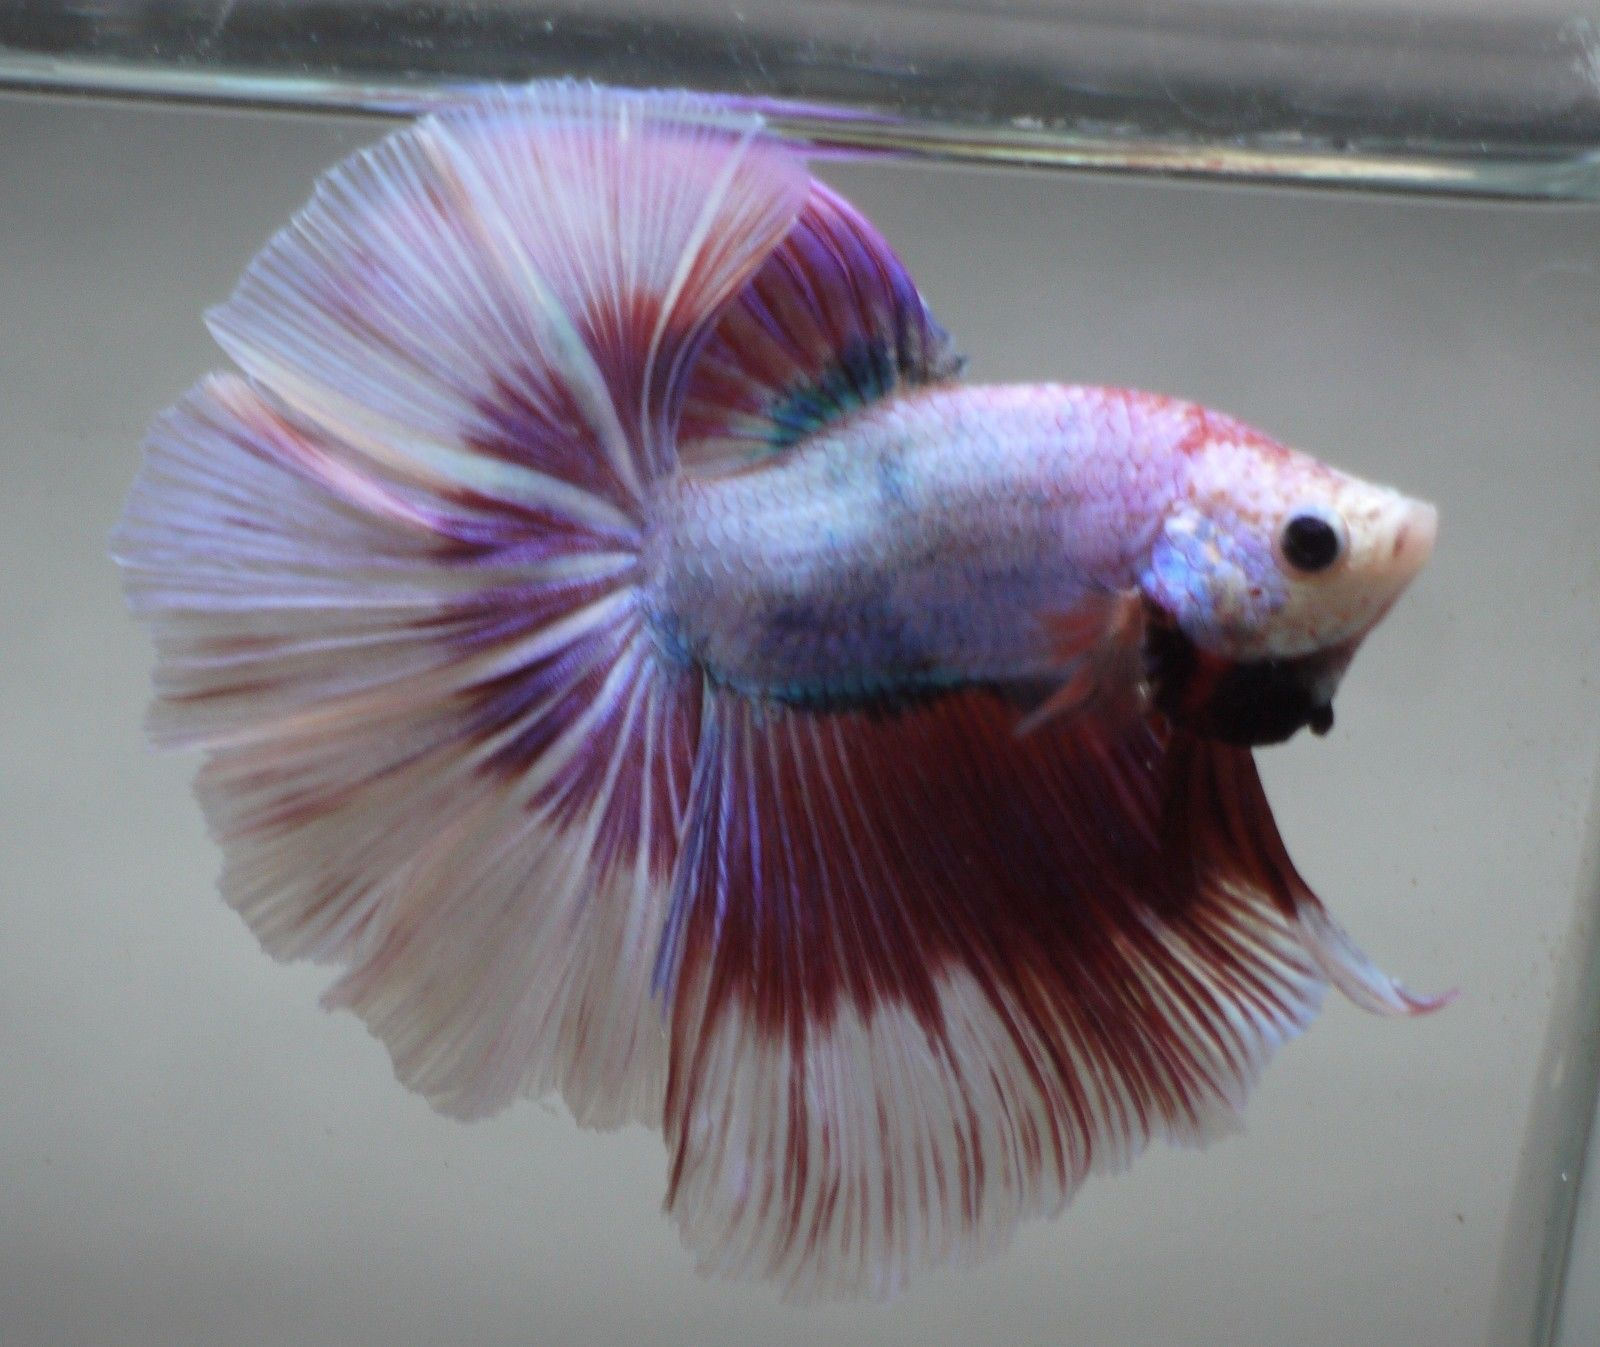 Betta Tropical Fish | Live Tropical Fish Red Pink Fancy Marble Halfmoon Betta B80 Common